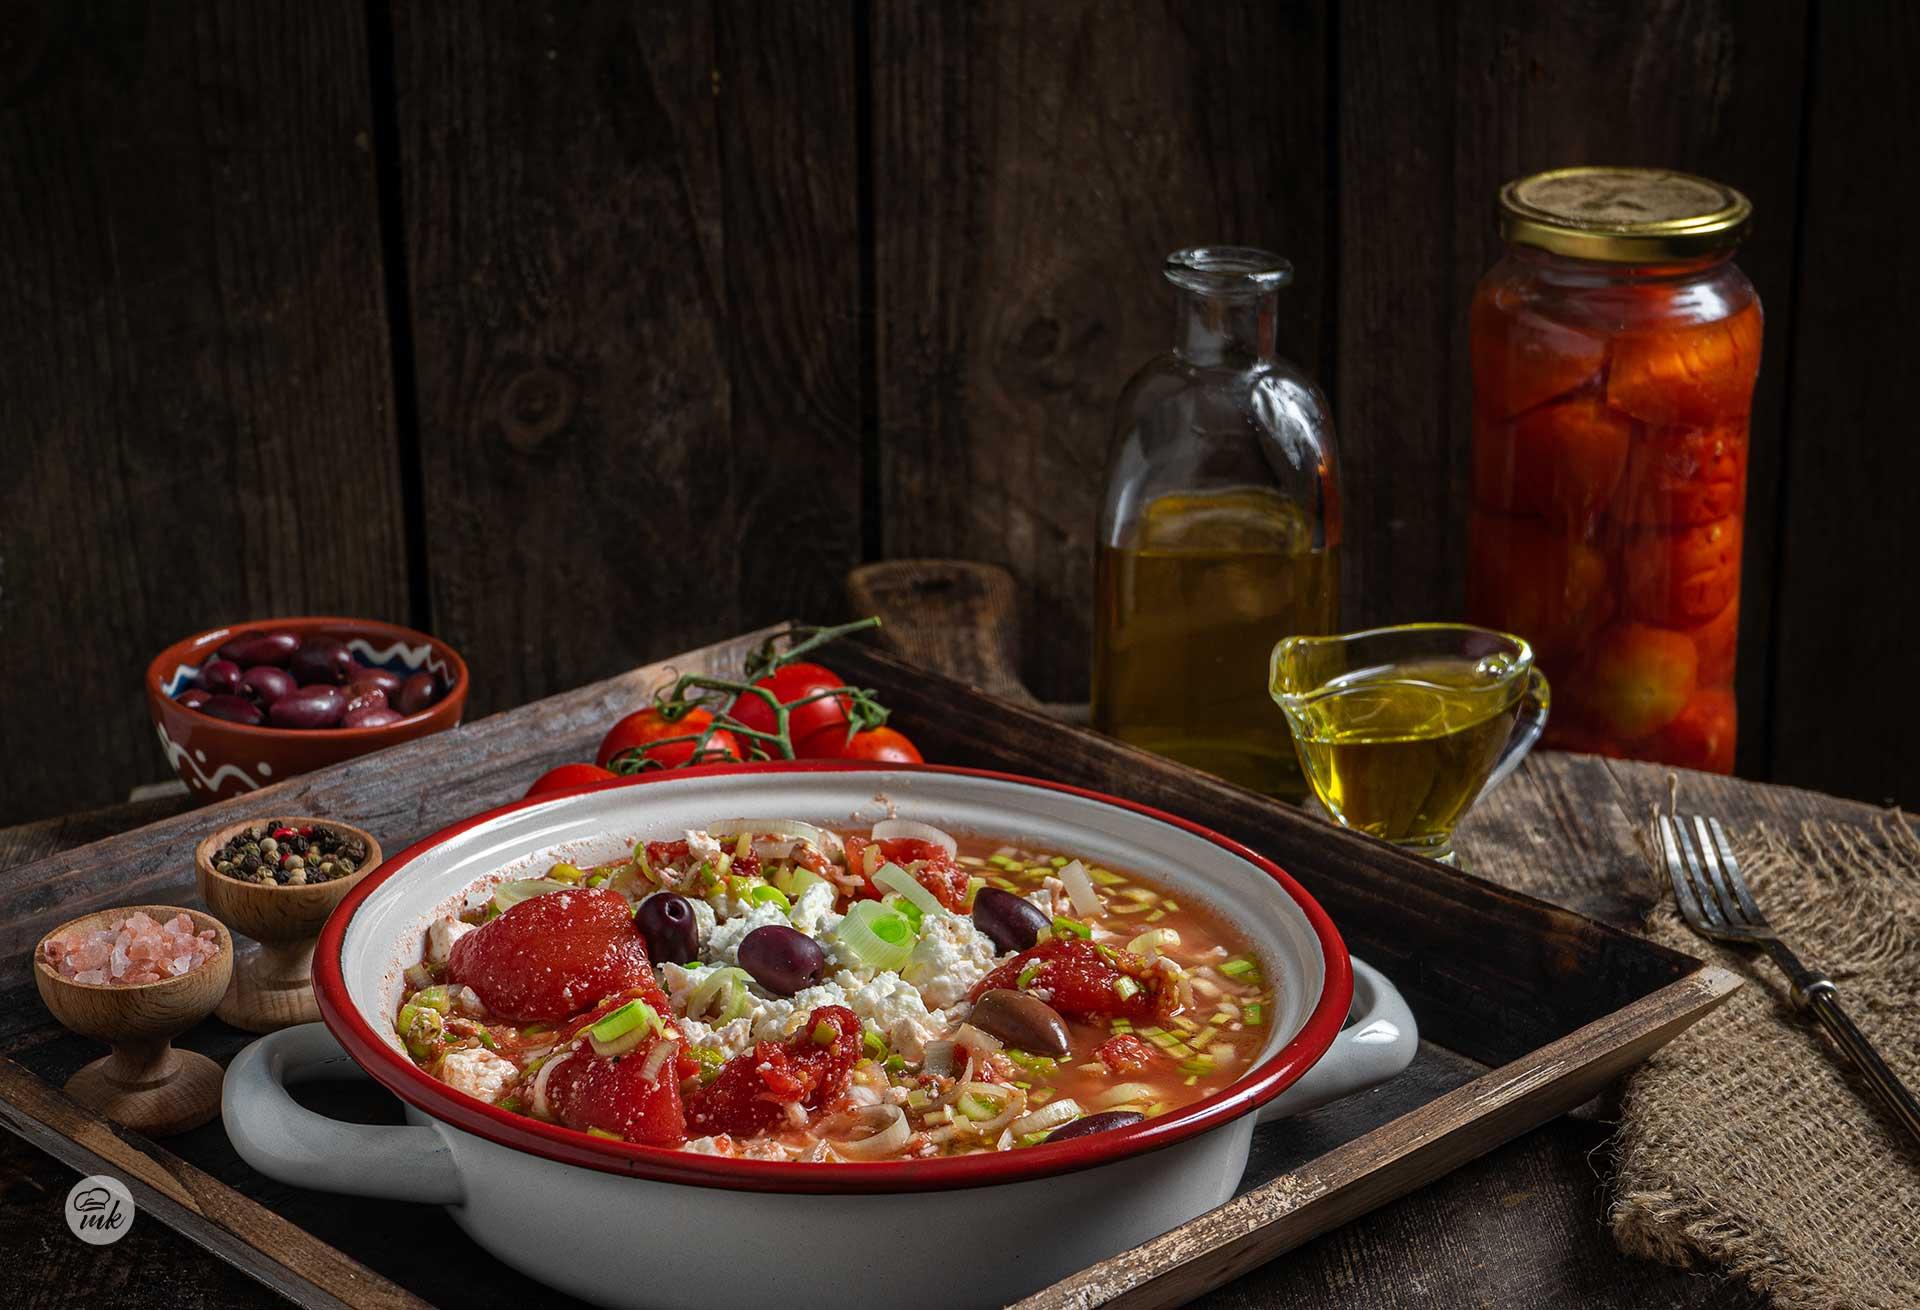 Салата от консервирани домати и праз, сервирана в дълбока чиния, с чери домати, зехтин, буркан домати, маслини, сол и шарен пипер, снимана отстрани